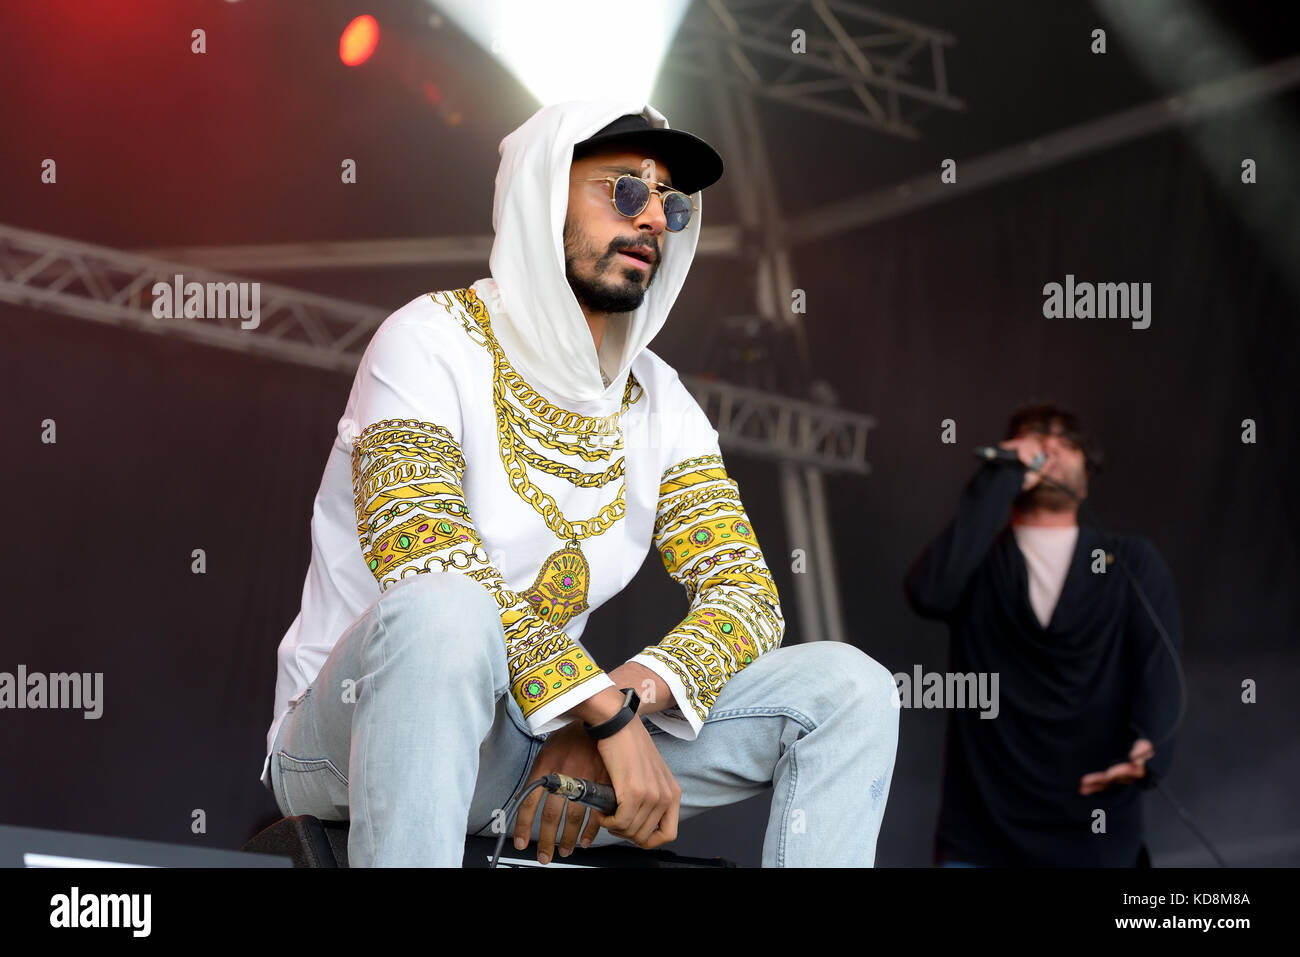 BARCELONA - JUN 3: Swet Shop Boys (Indian Pakistani hip hop group, consisting of rappers Heems and Riz MC) perform Stock Photo